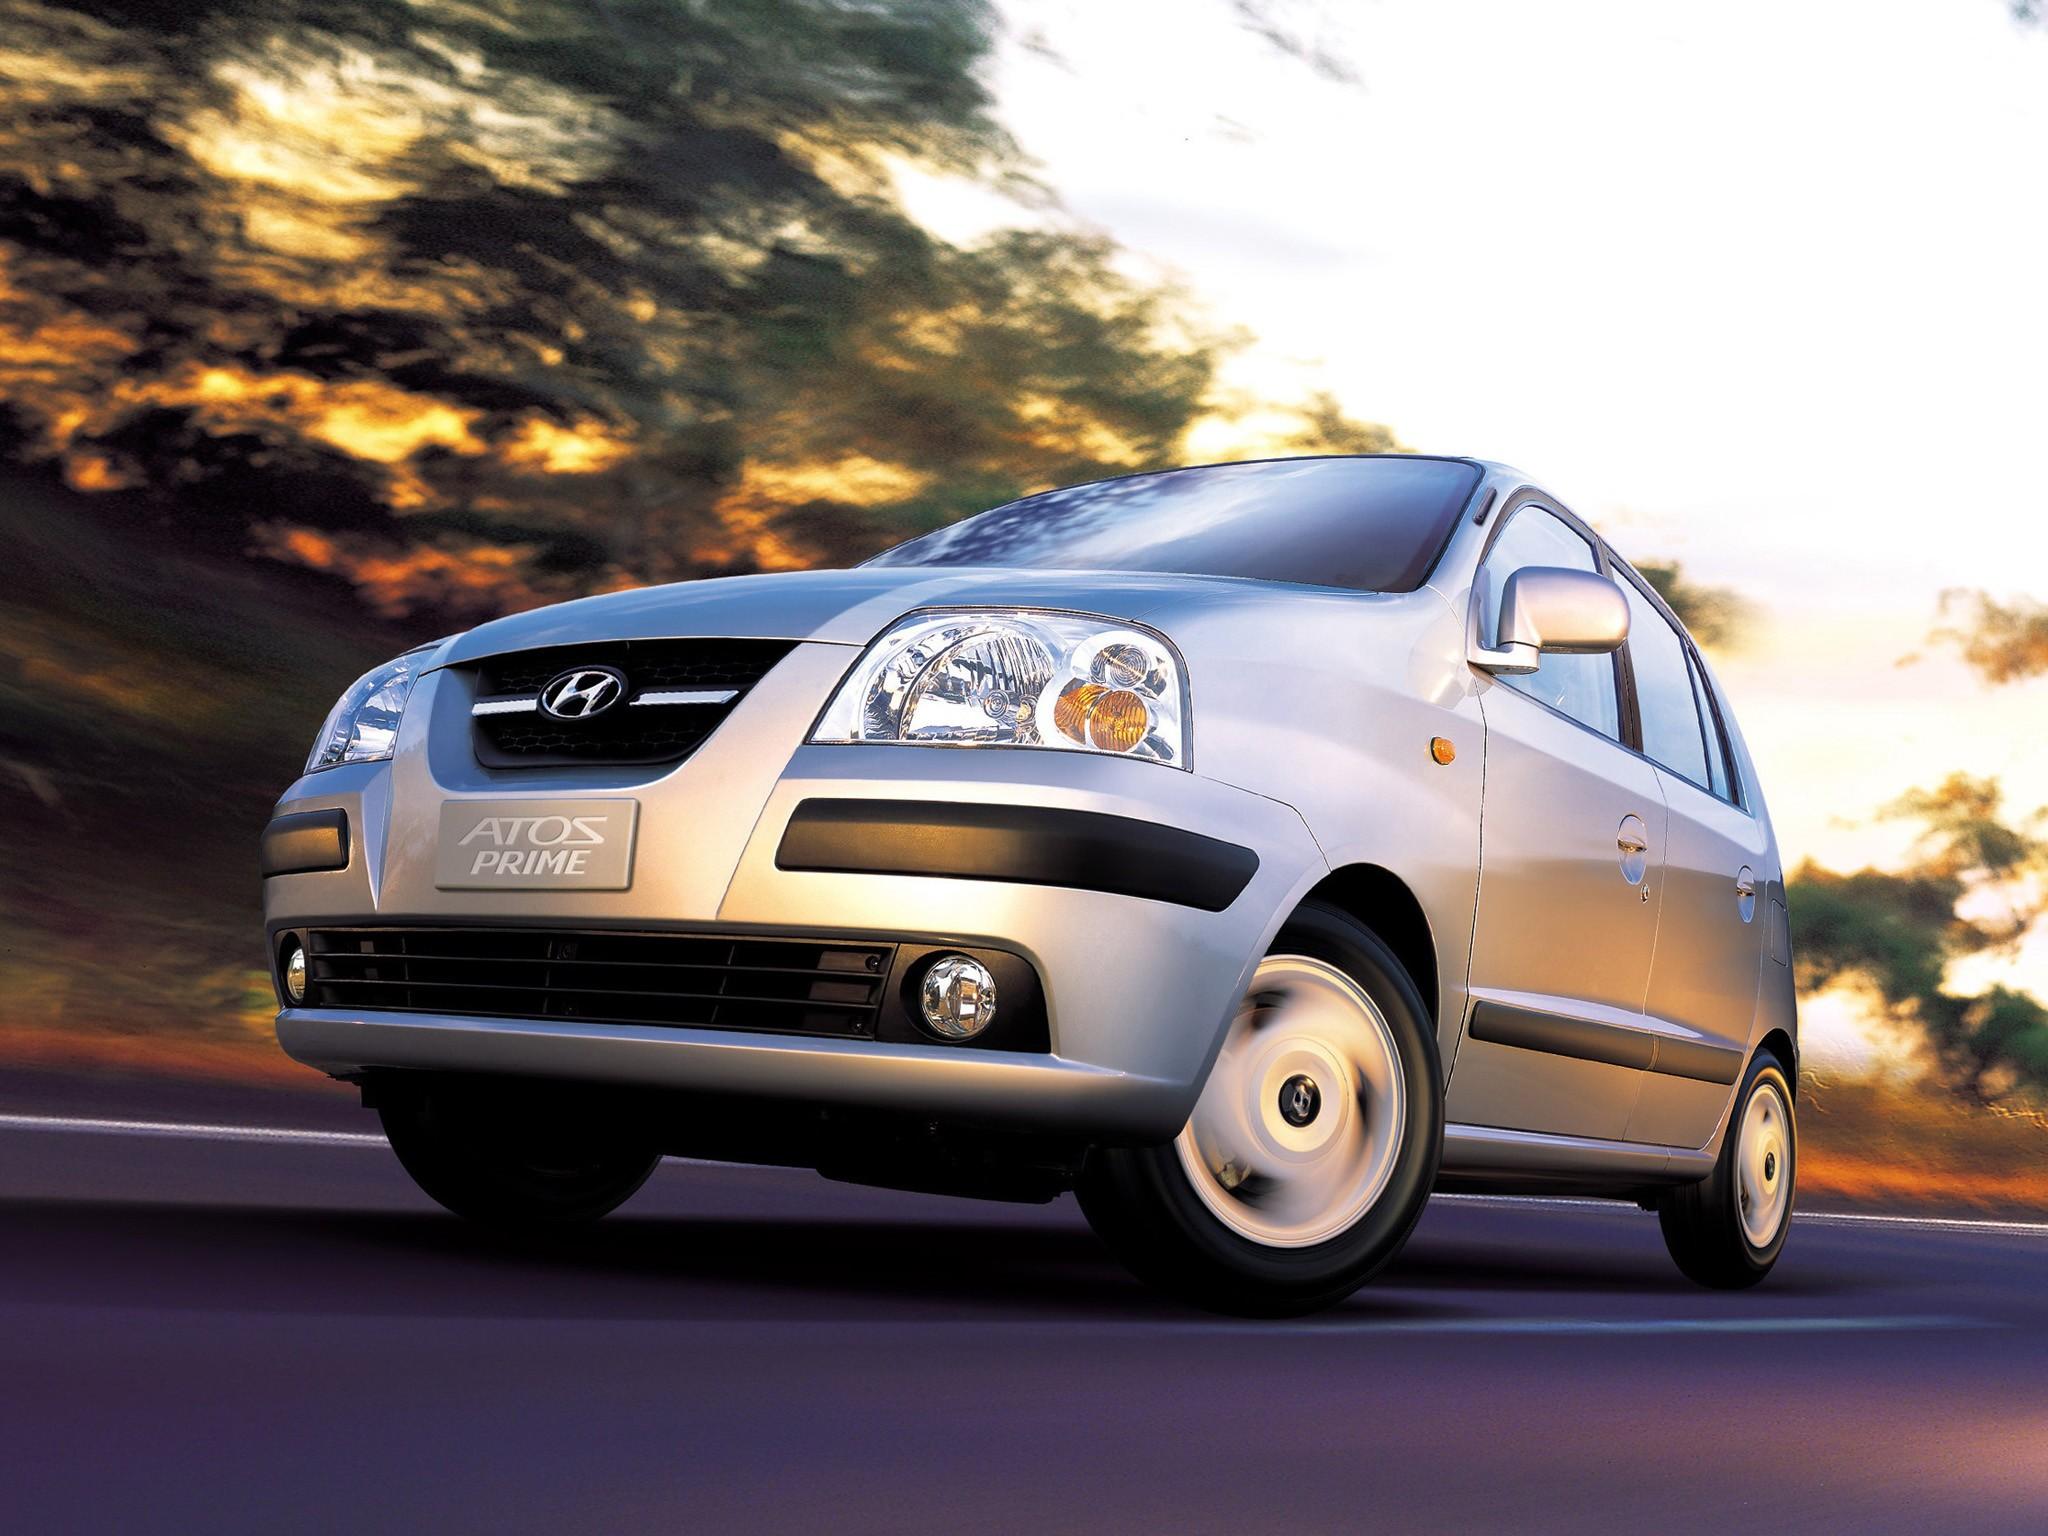 Green Buick Gmc >> HYUNDAI Atos - 2005, 2006, 2007, 2008 - autoevolution